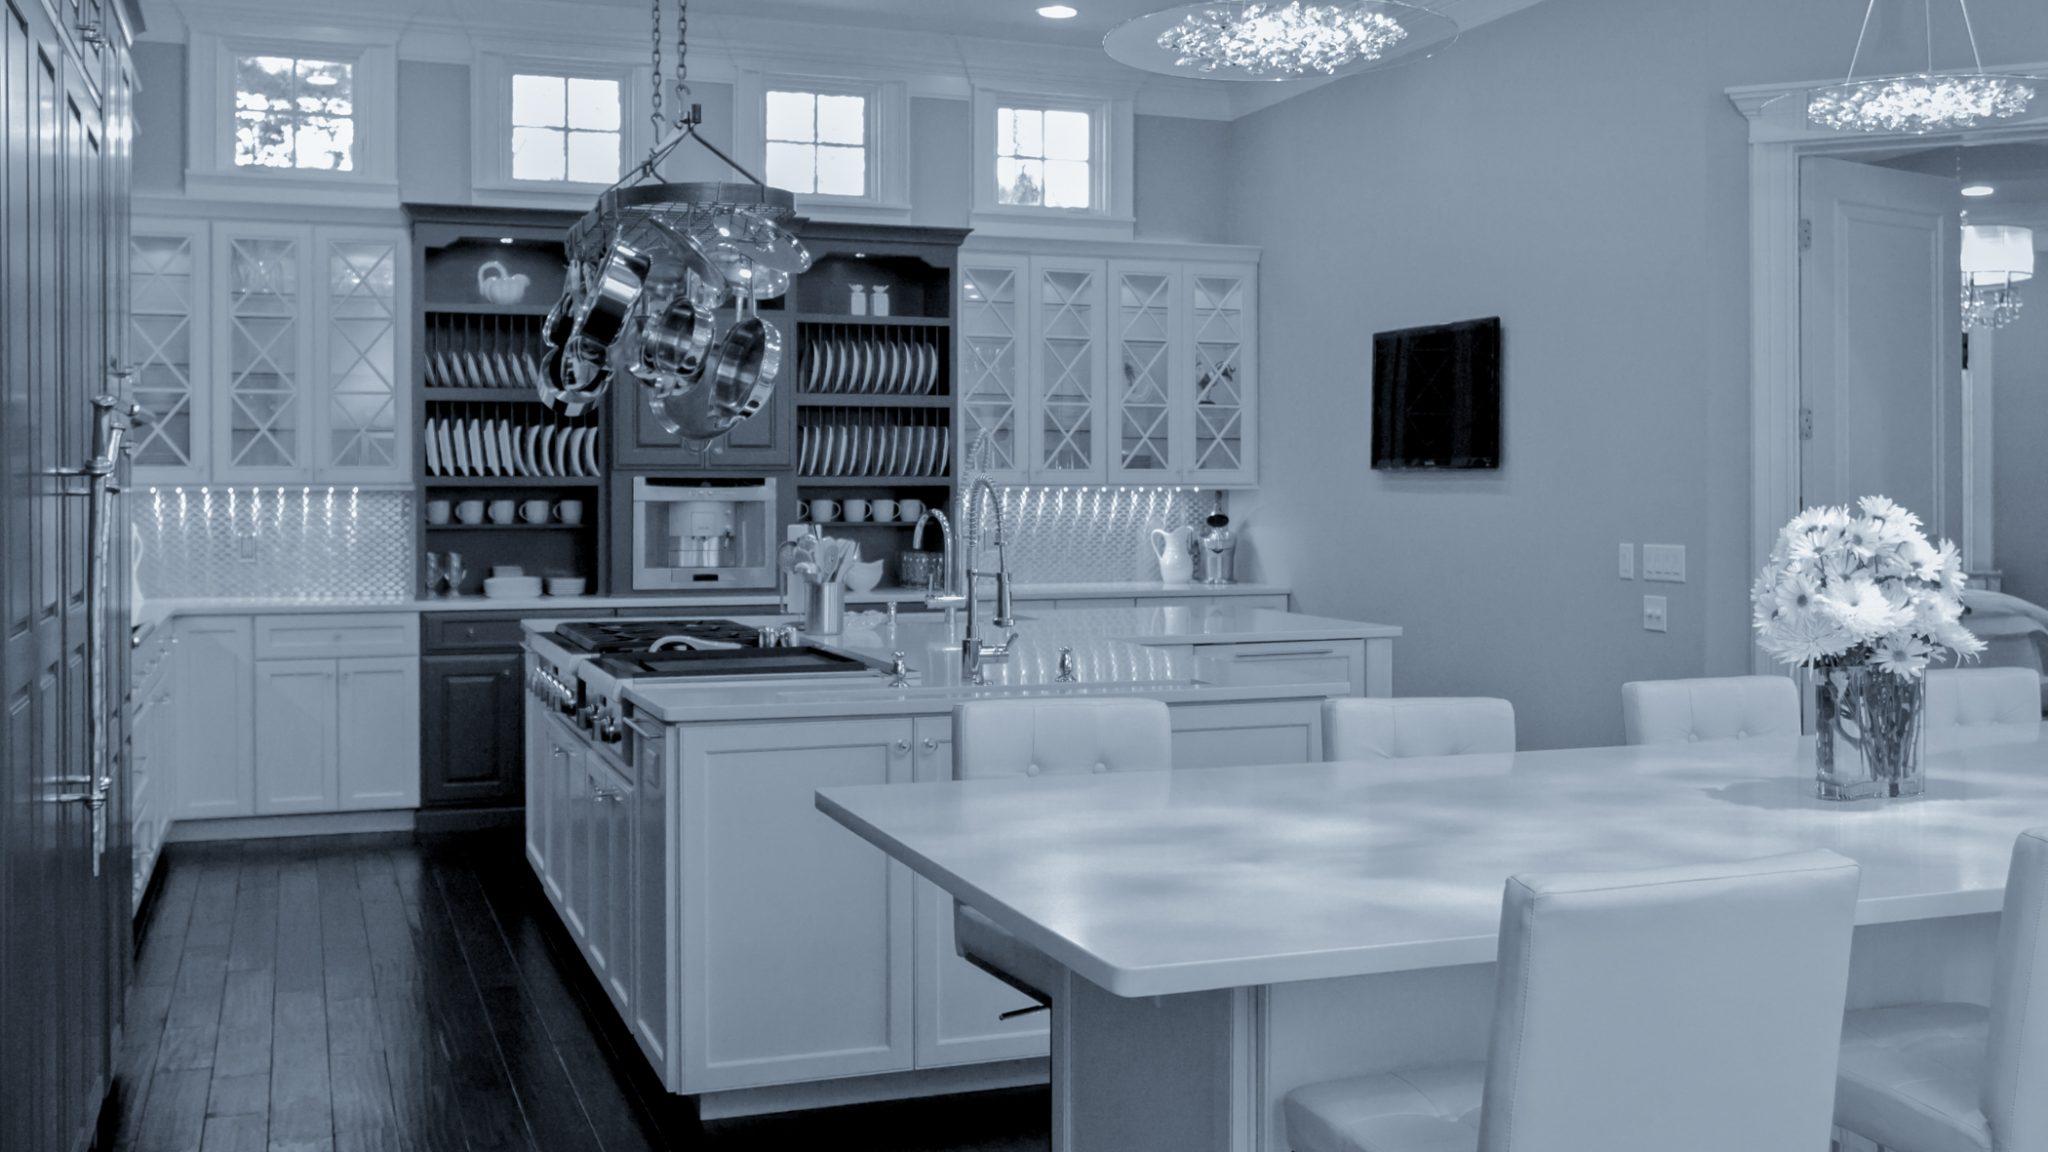 kitchens etc kitchen design on 30a 4 Kitchens Etc 30A